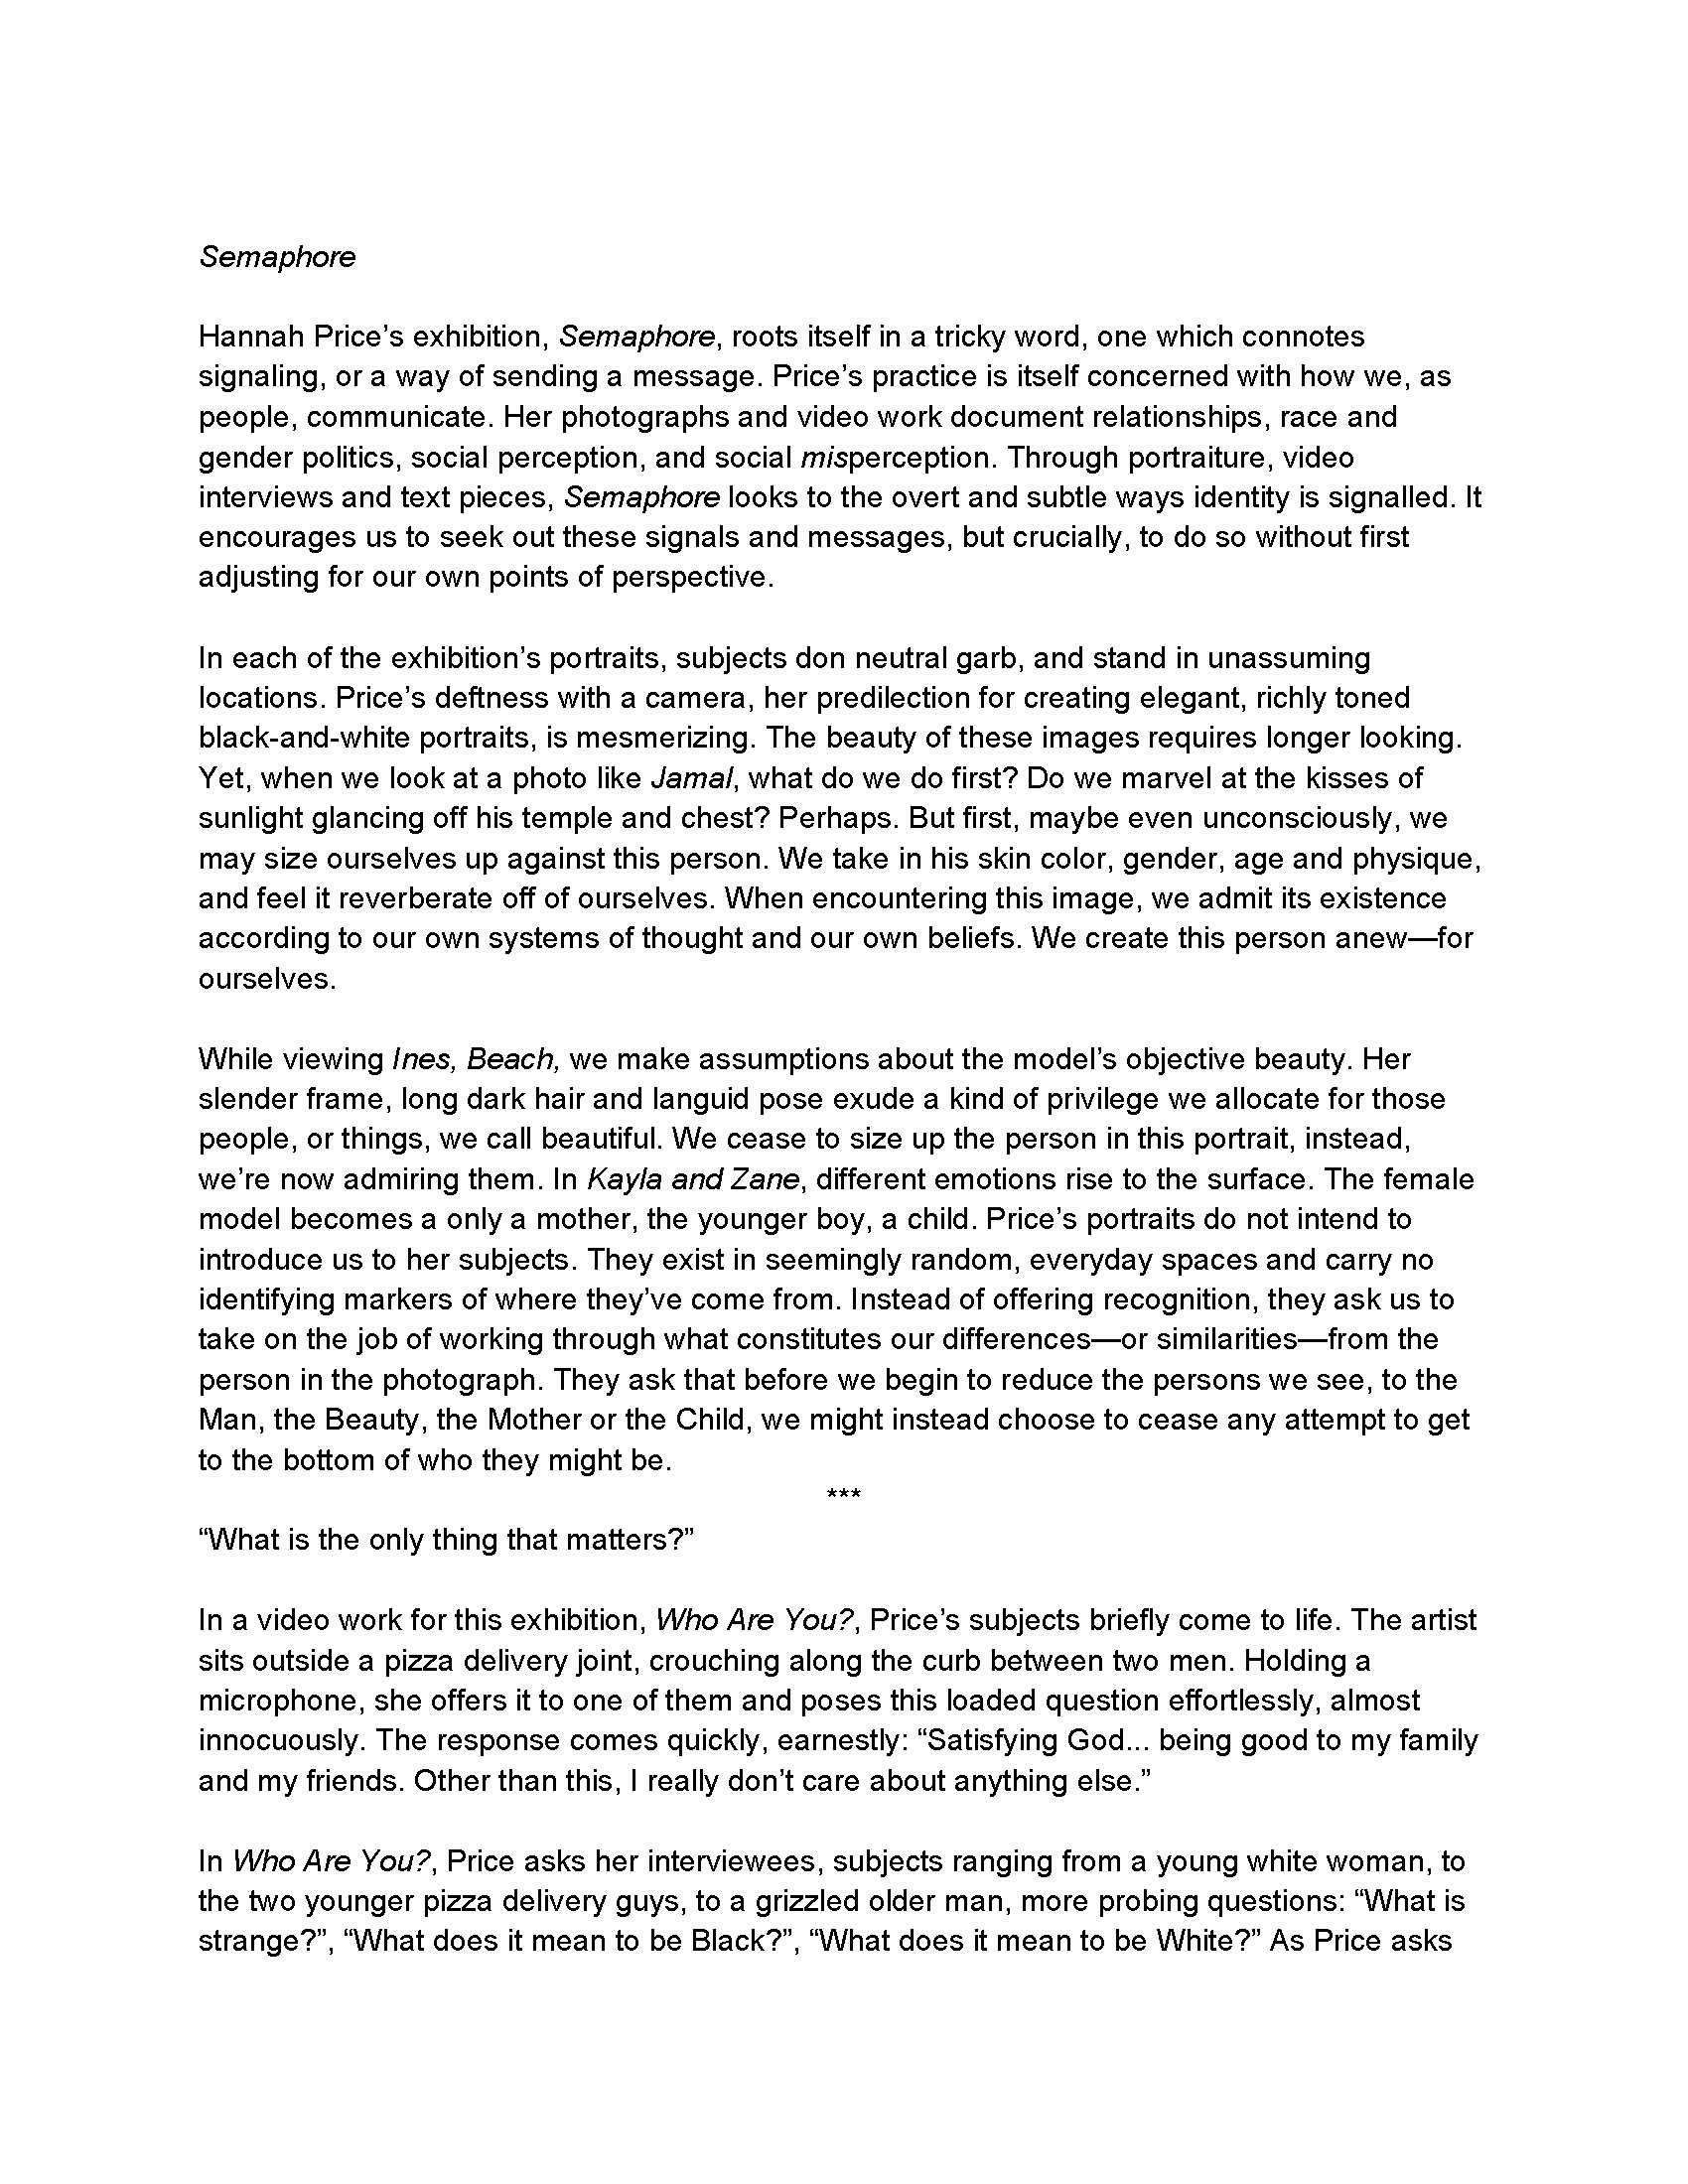 Hannah Price Essay 8_16_18_Page_1.jpg